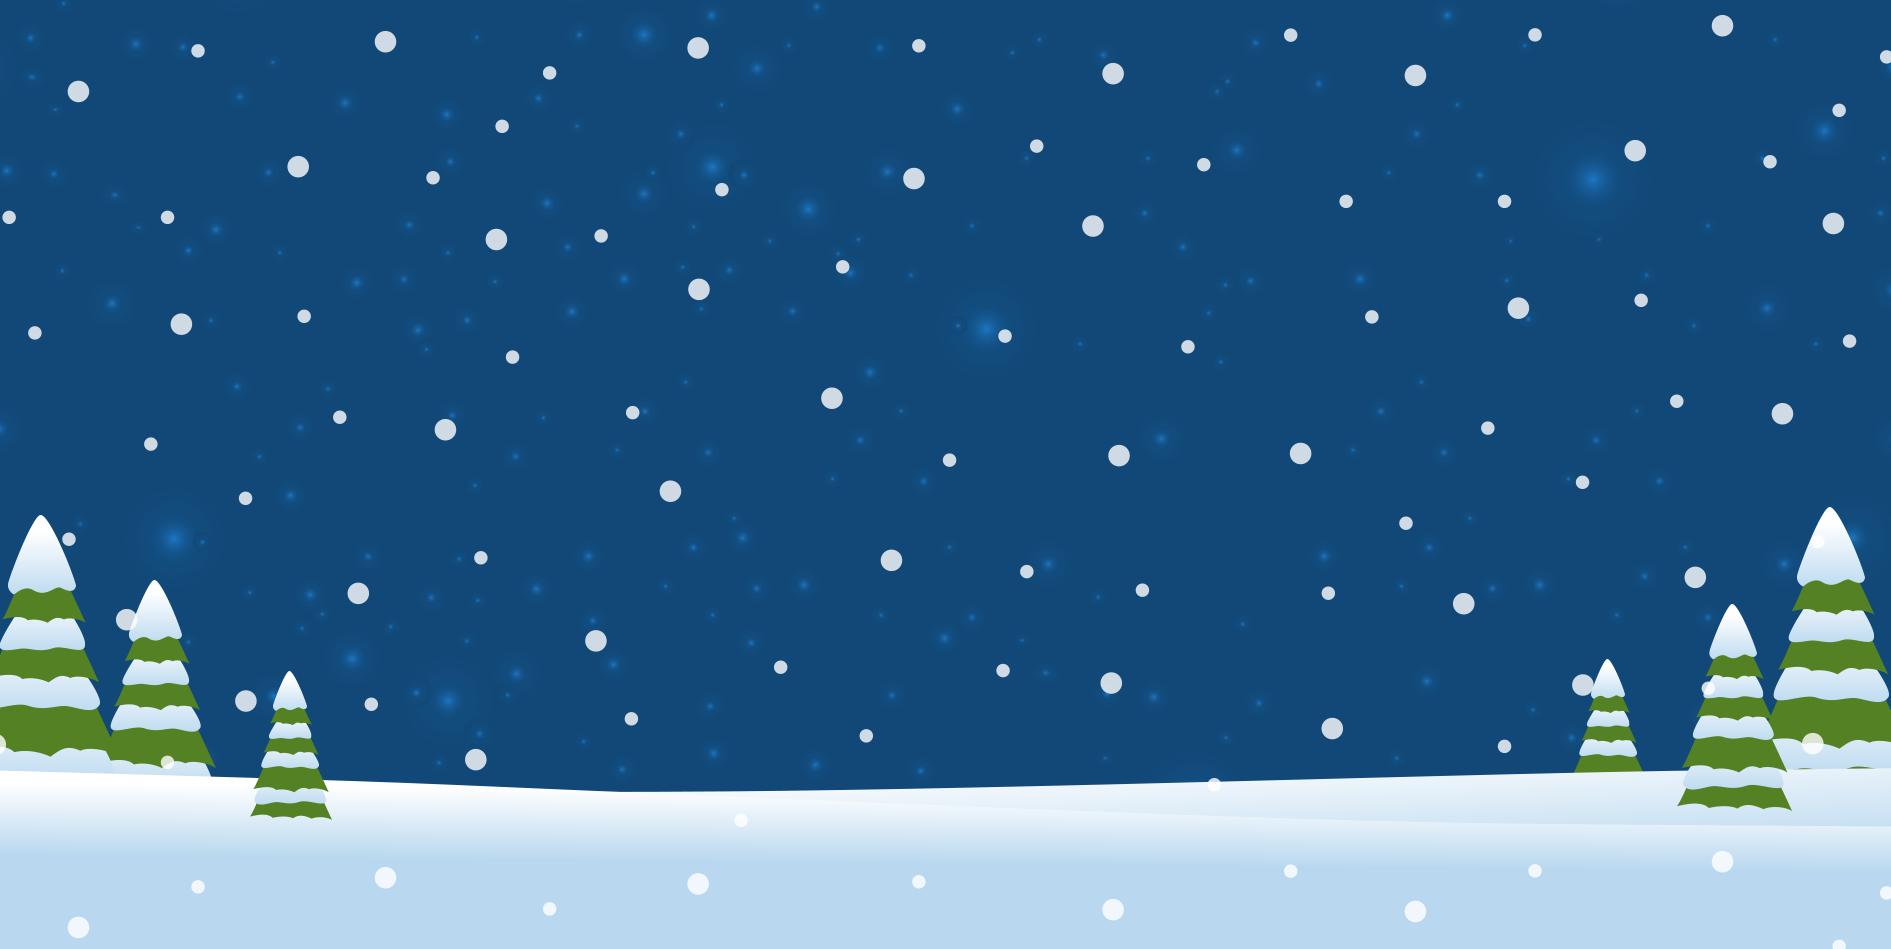 Propierge Christmas Background